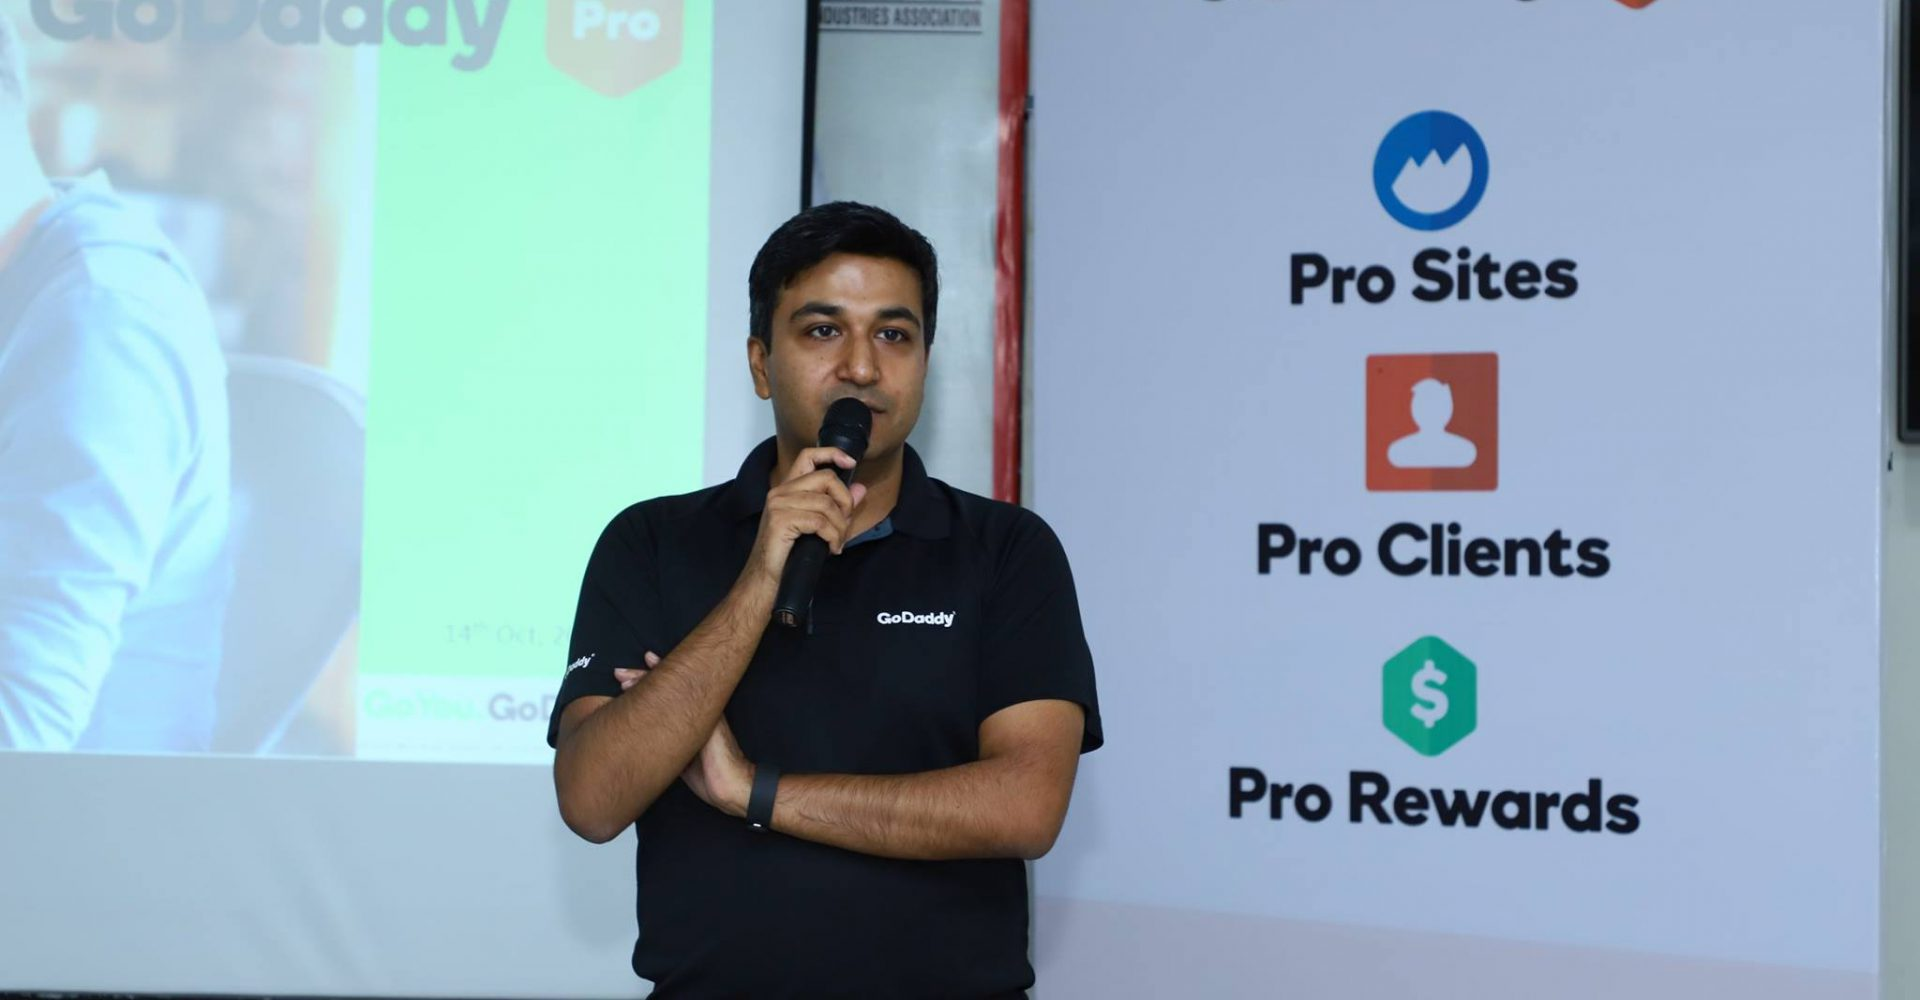 Gaurav - Speaker at the GoDaddy Pro Event Lucknow 2018